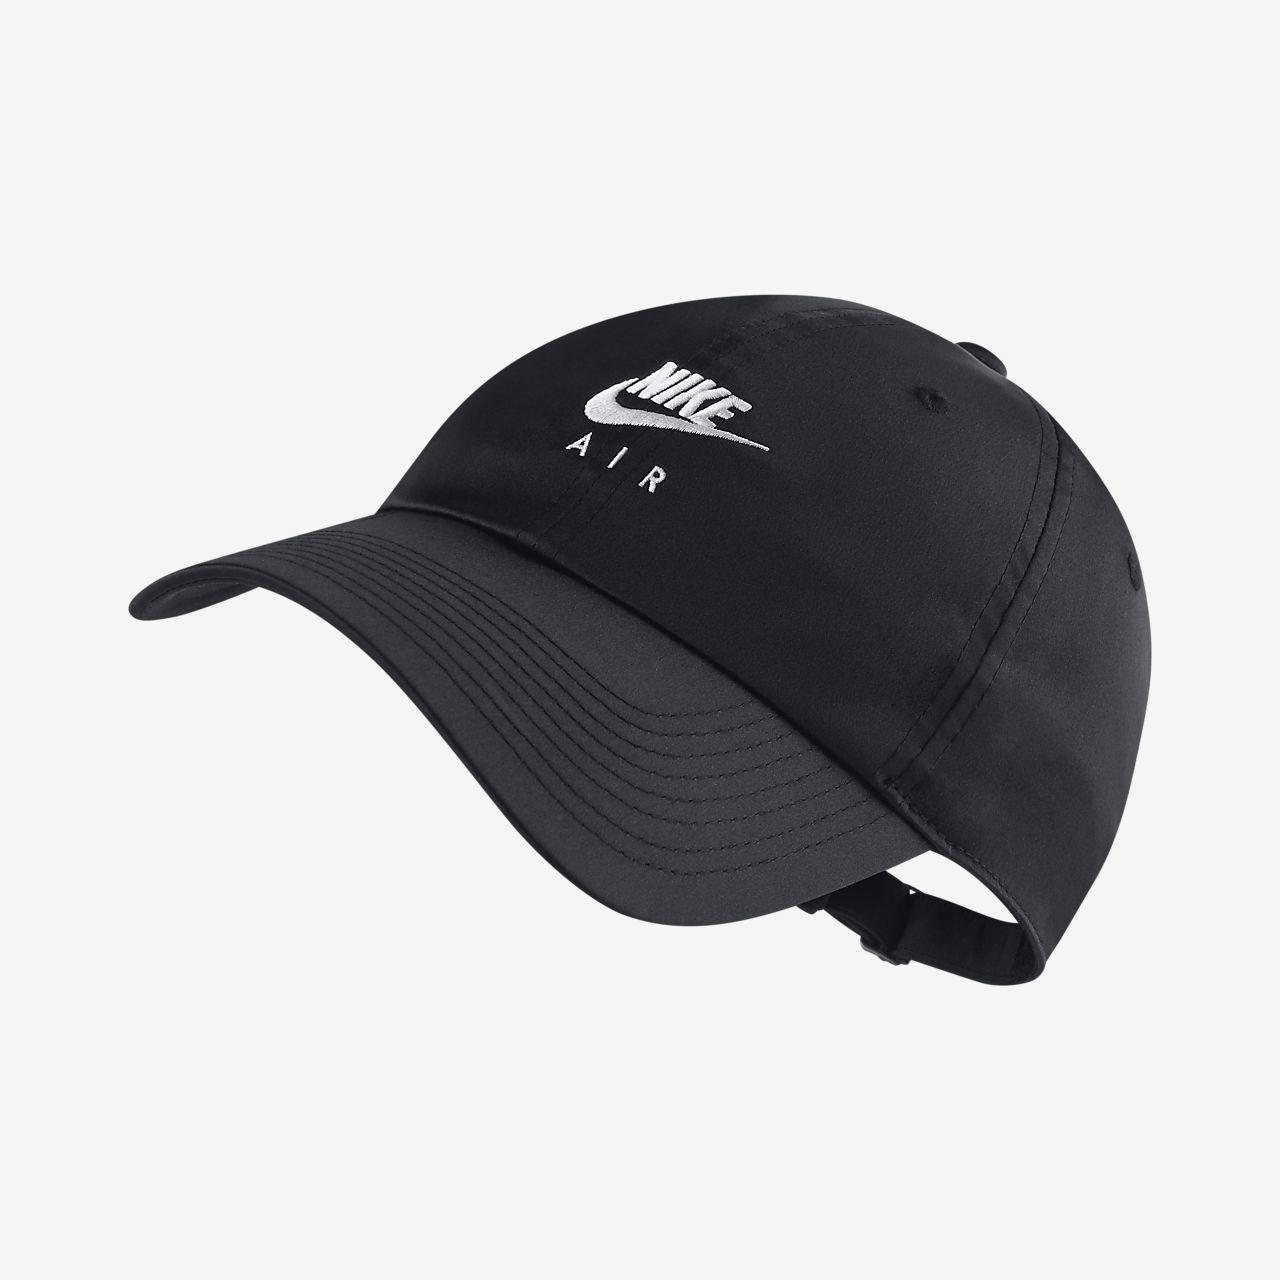 5ad643f9137685 Nike Air Heritage86 Women's Adjustable Hat. Nike.com